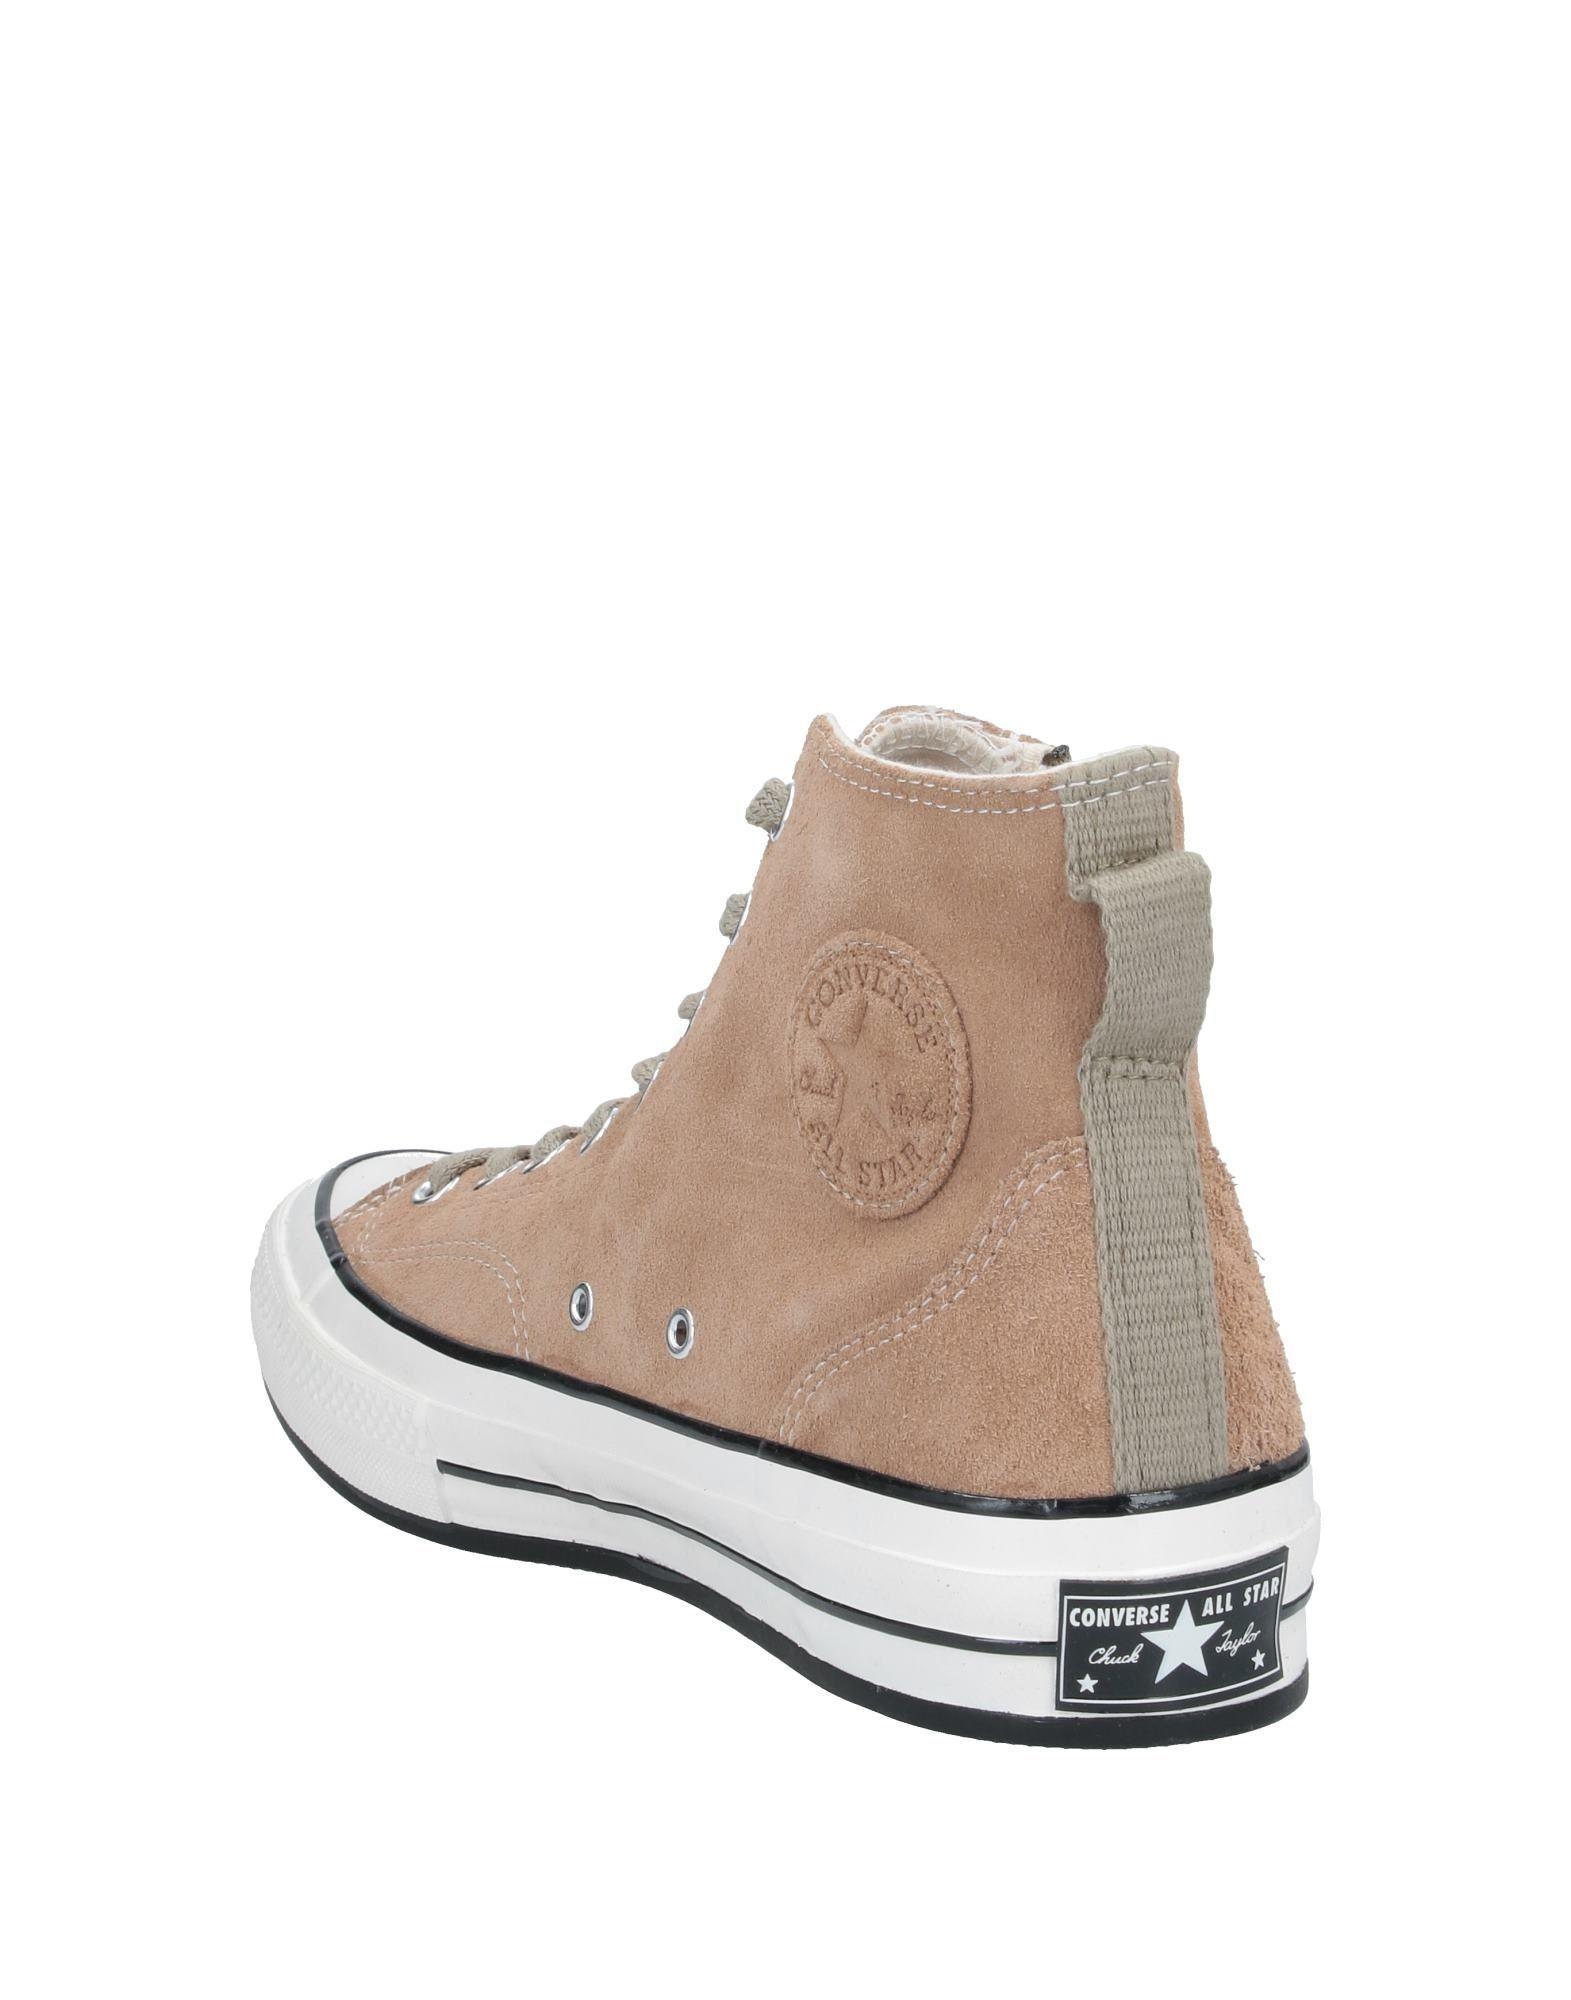 Sneakers abotinadas Converse de Ante de color Neutro para hombre